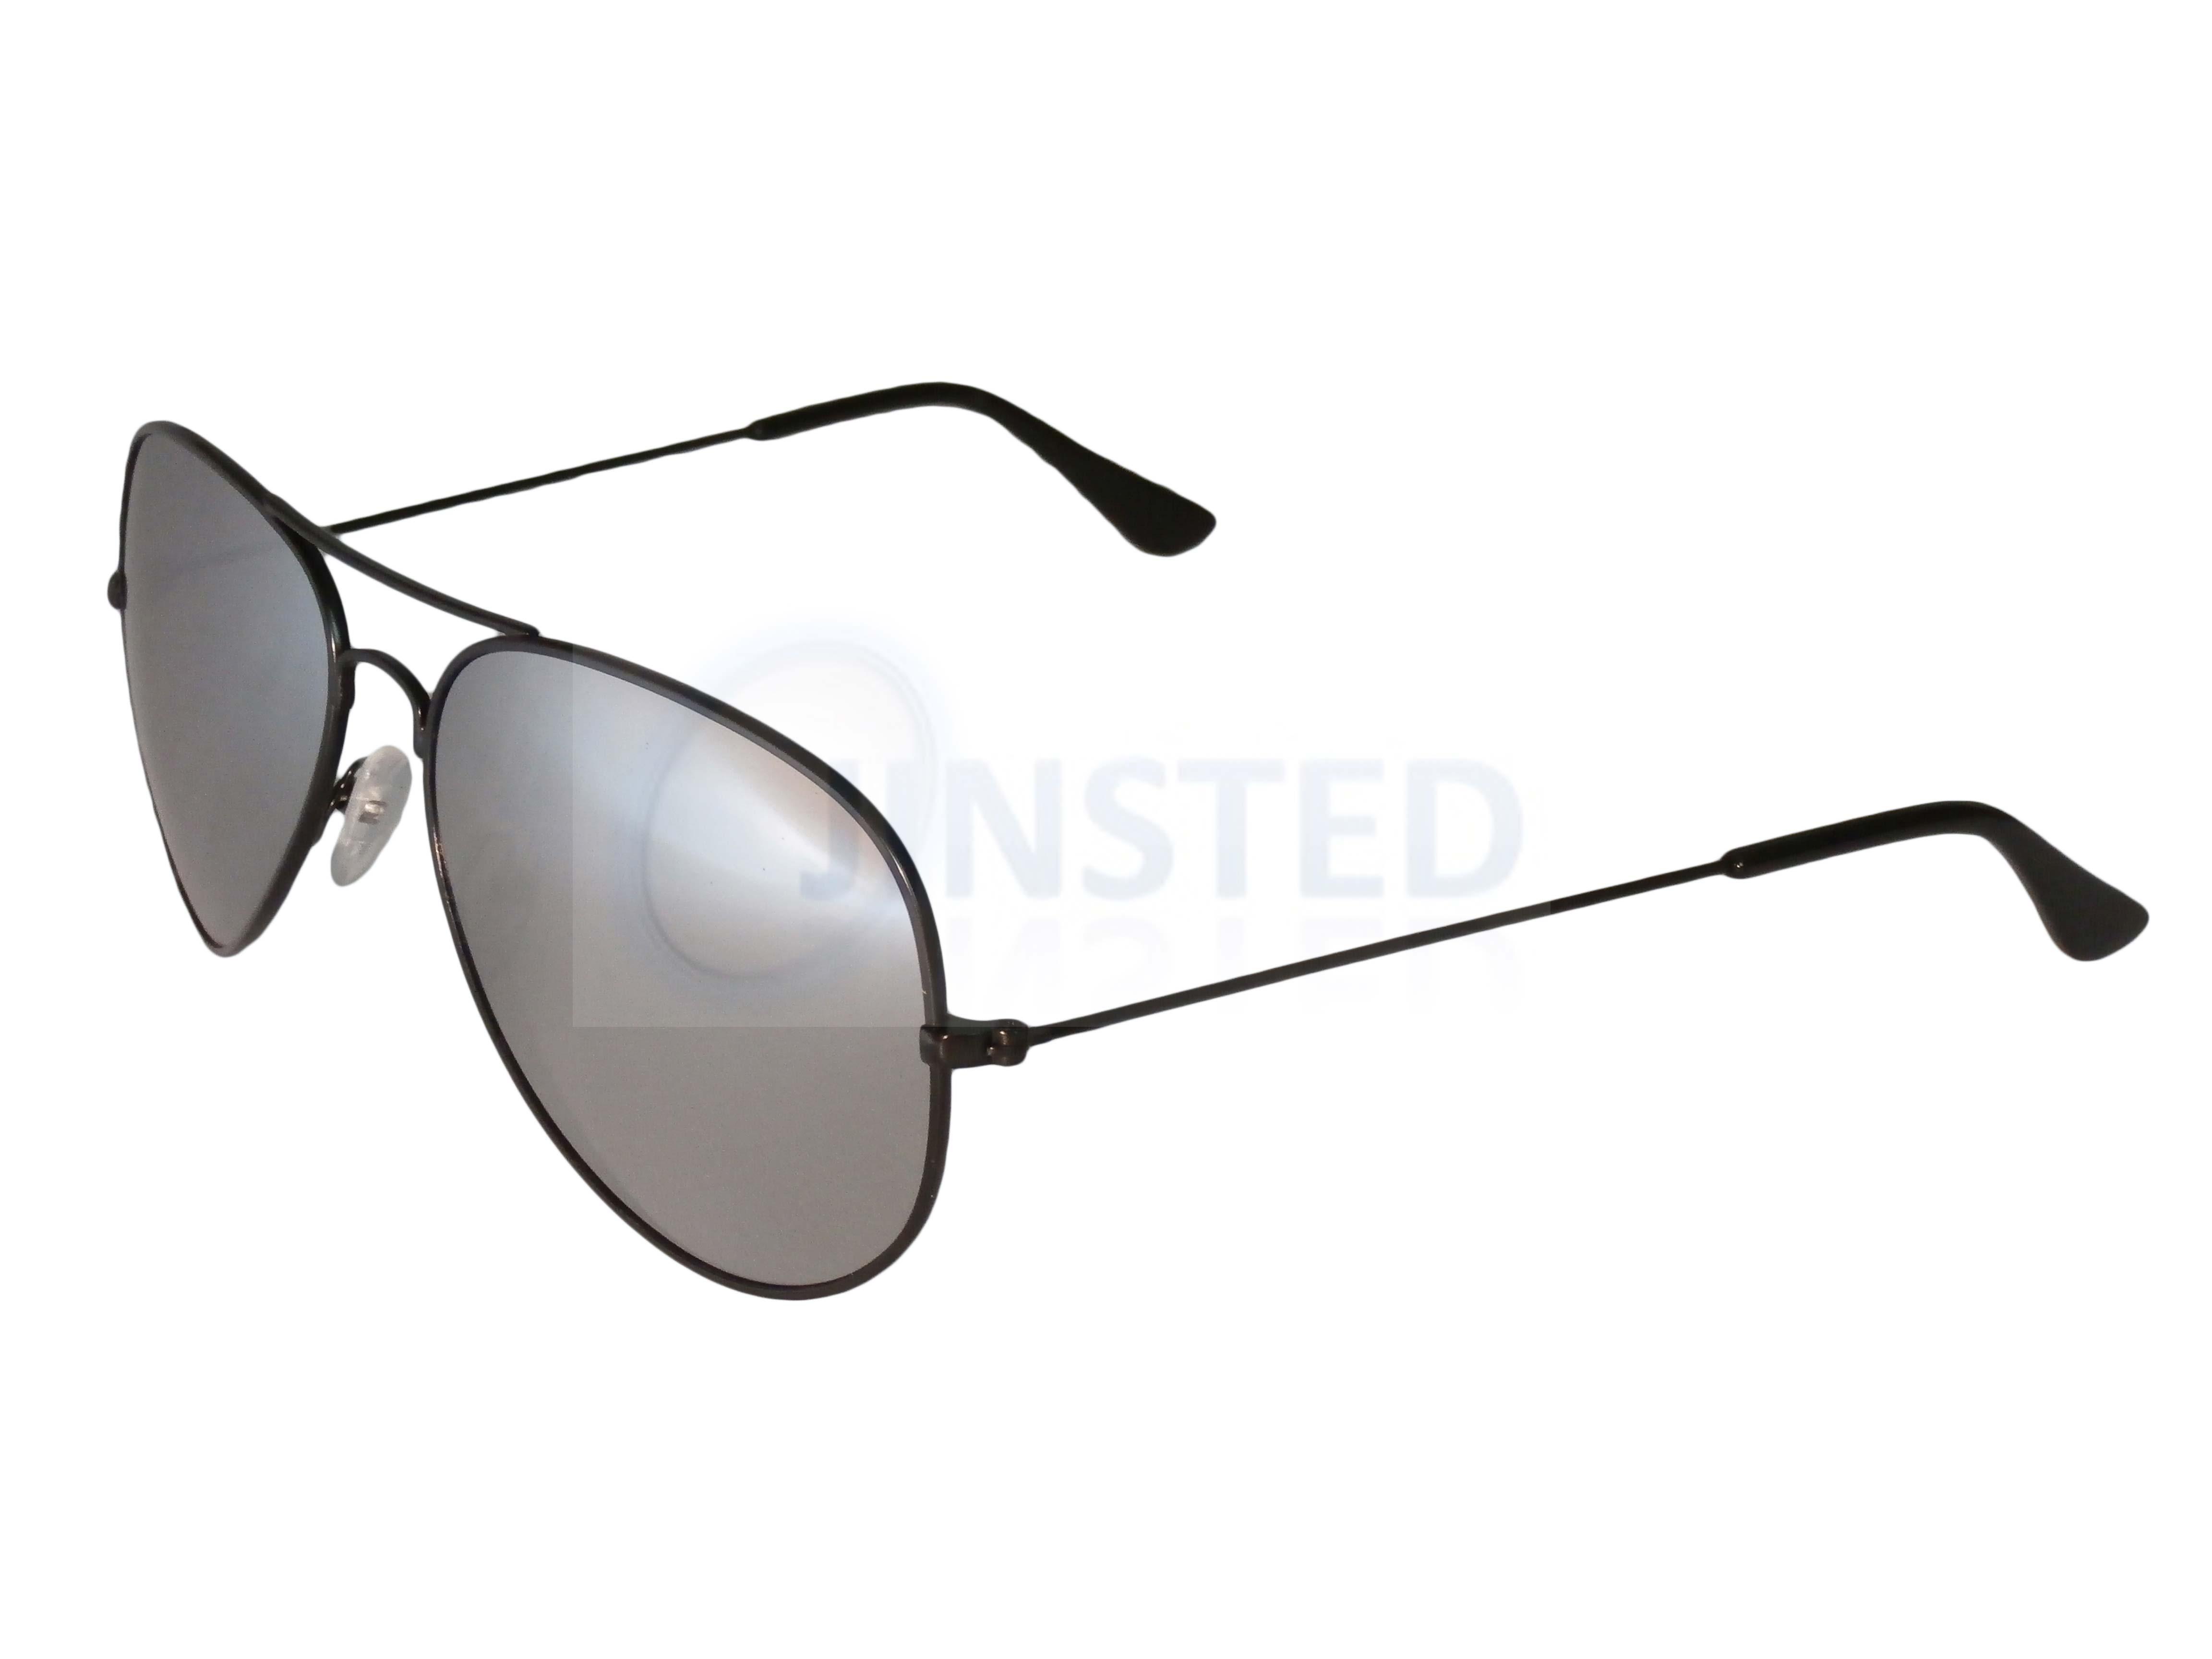 Adult Pilot Sunglasses Silver Mirrored Reflective Lens Sunnies Black Frame AA006